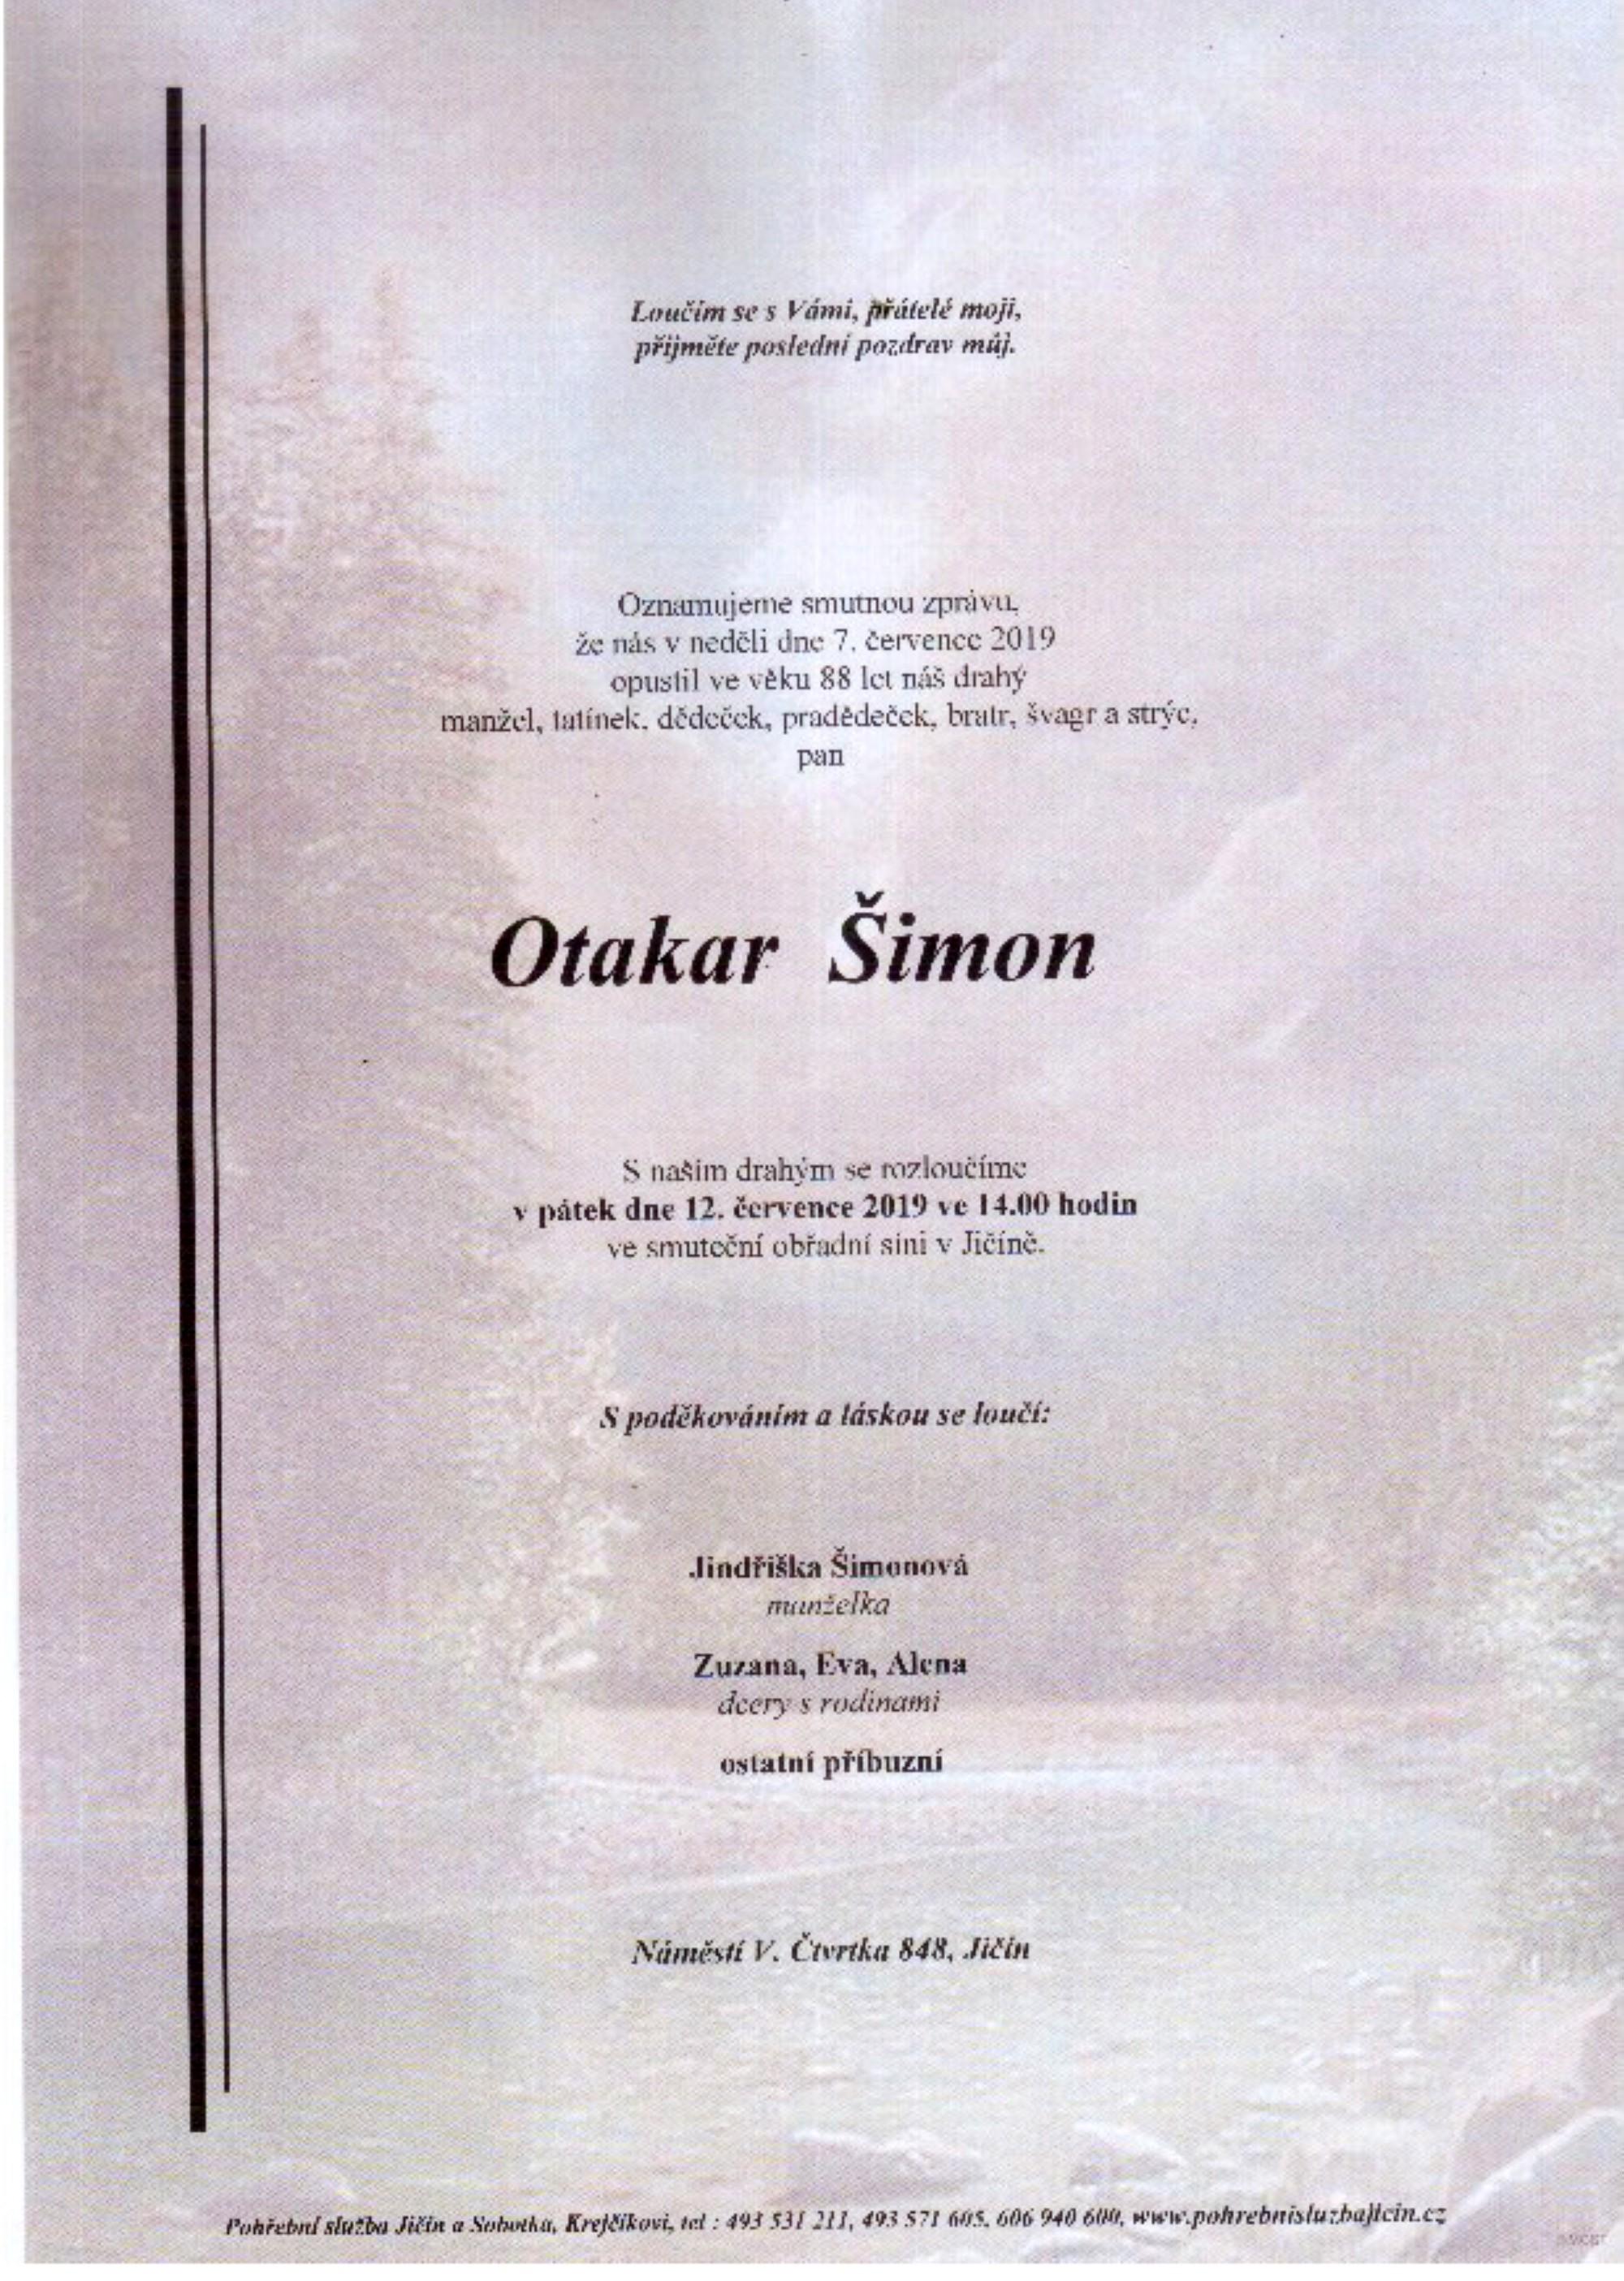 Otakar Šimon